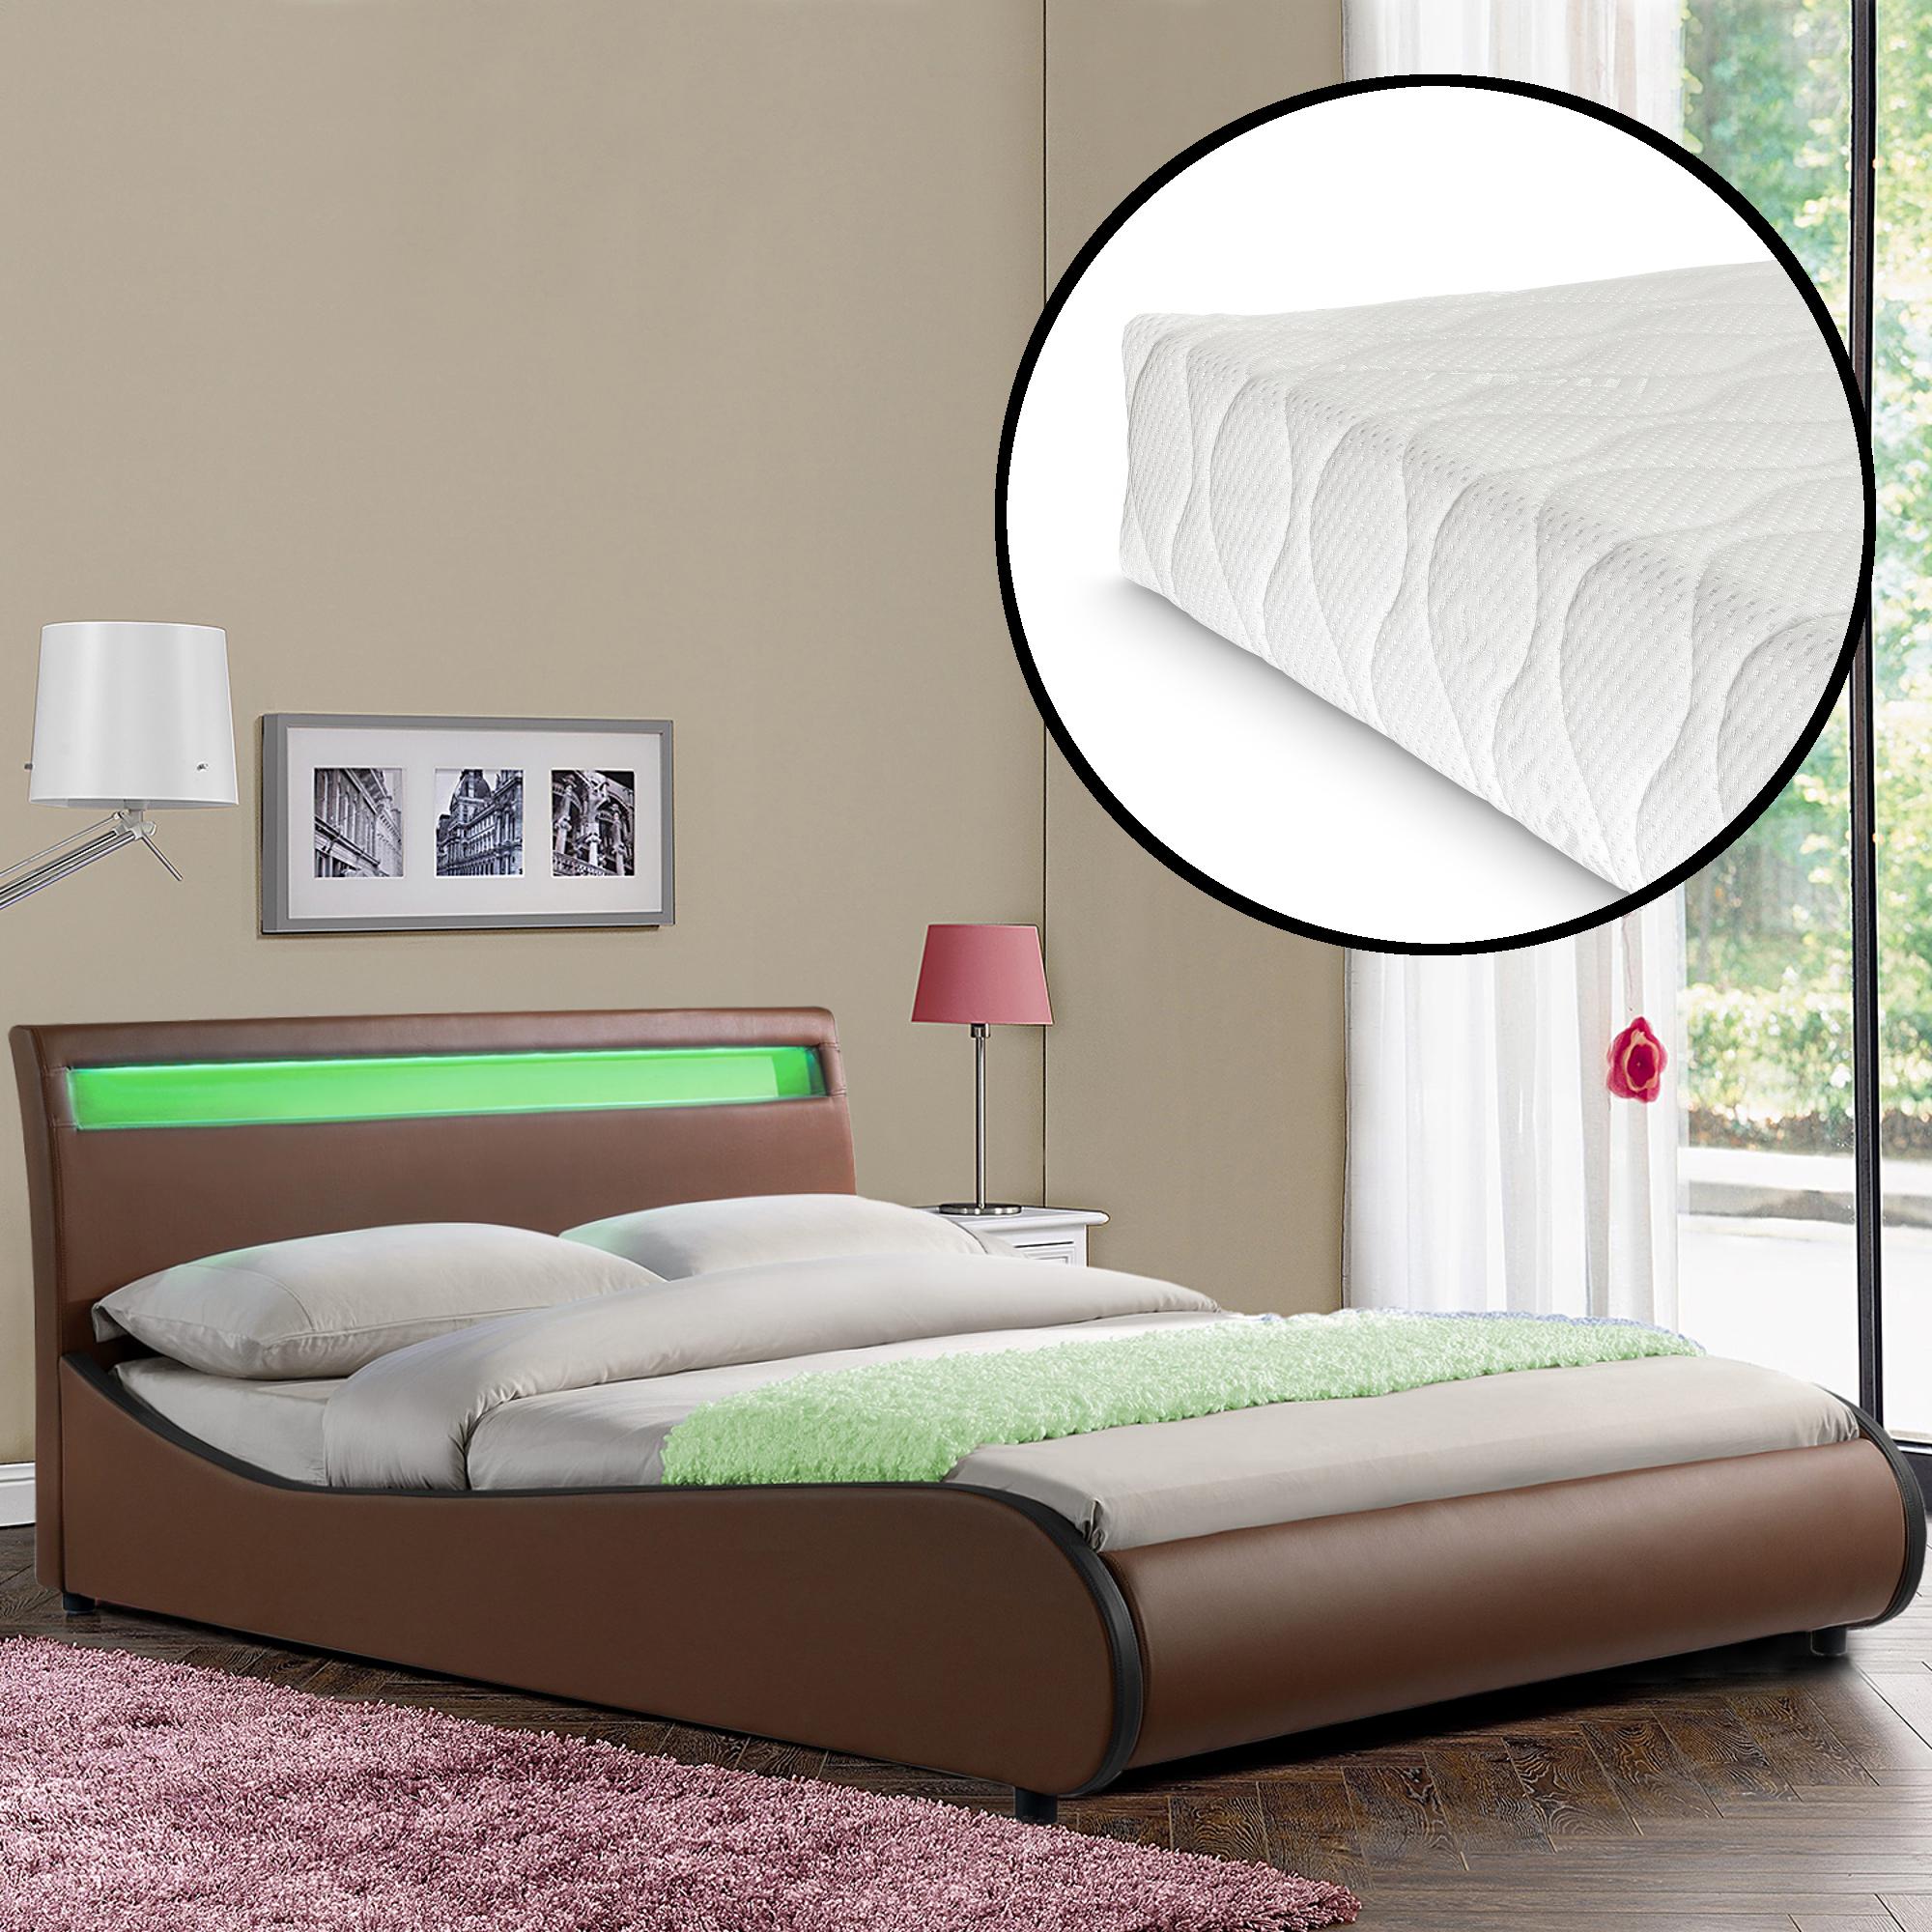 corium led polsterbett mit matratze 140 x 200 cm braun. Black Bedroom Furniture Sets. Home Design Ideas